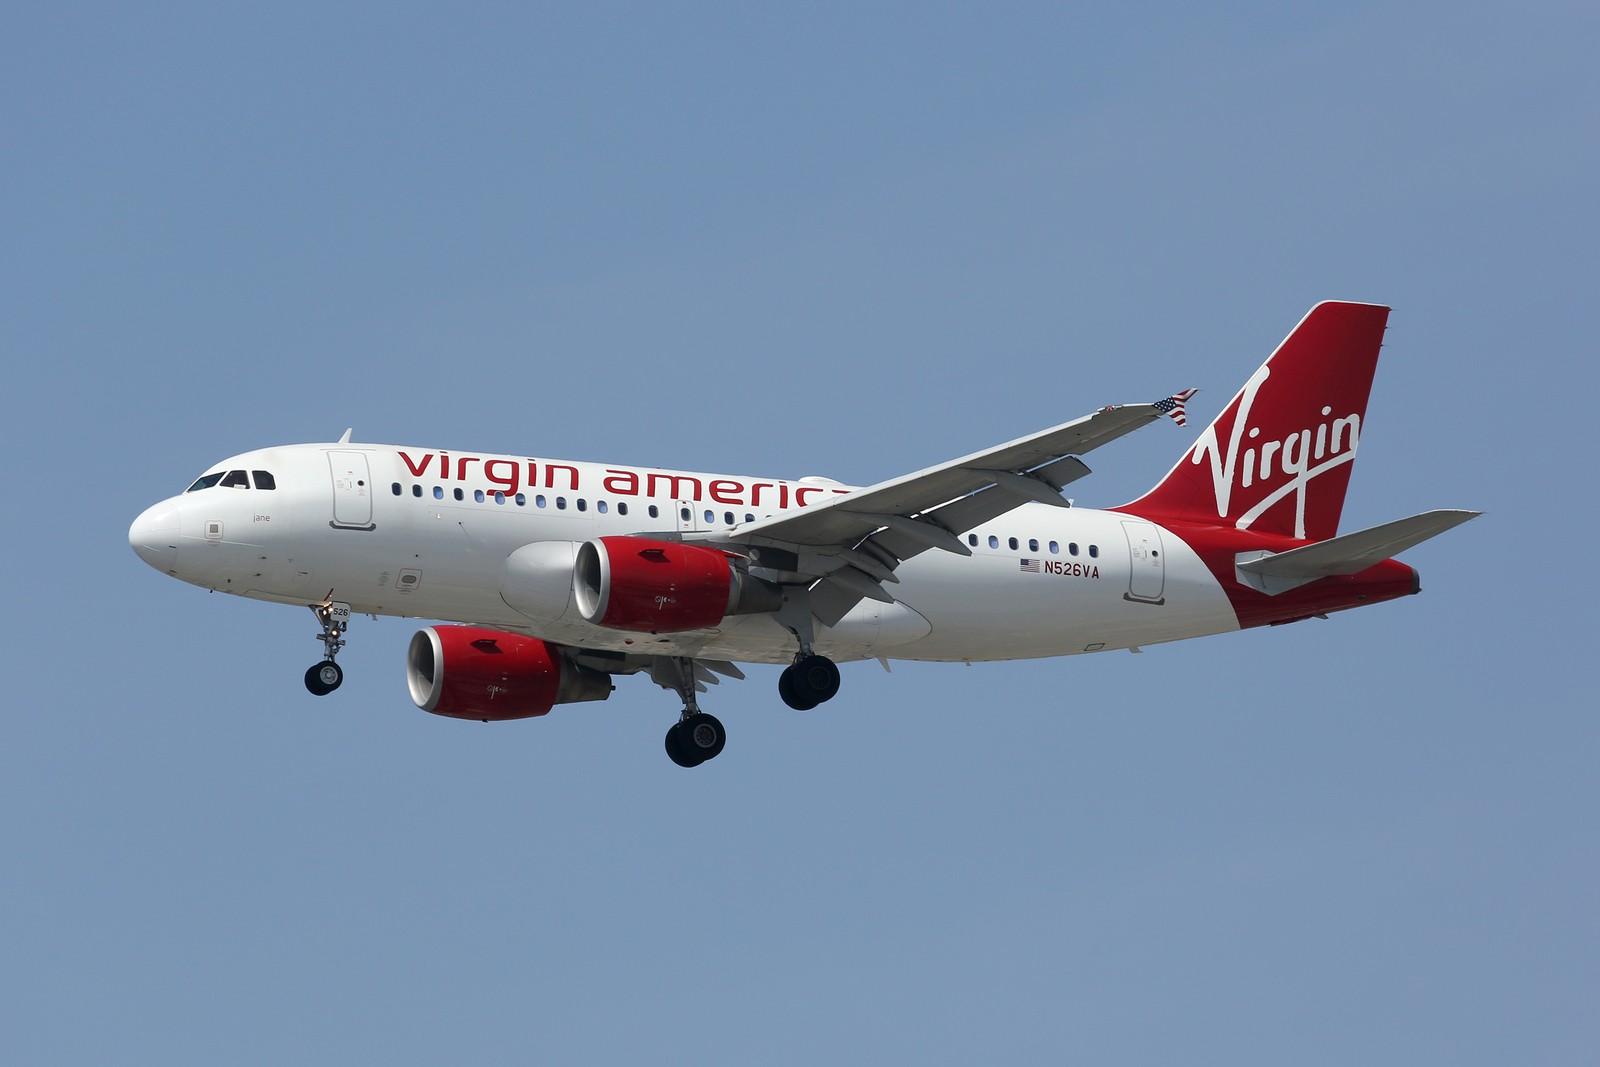 Virgin America Airbus A319